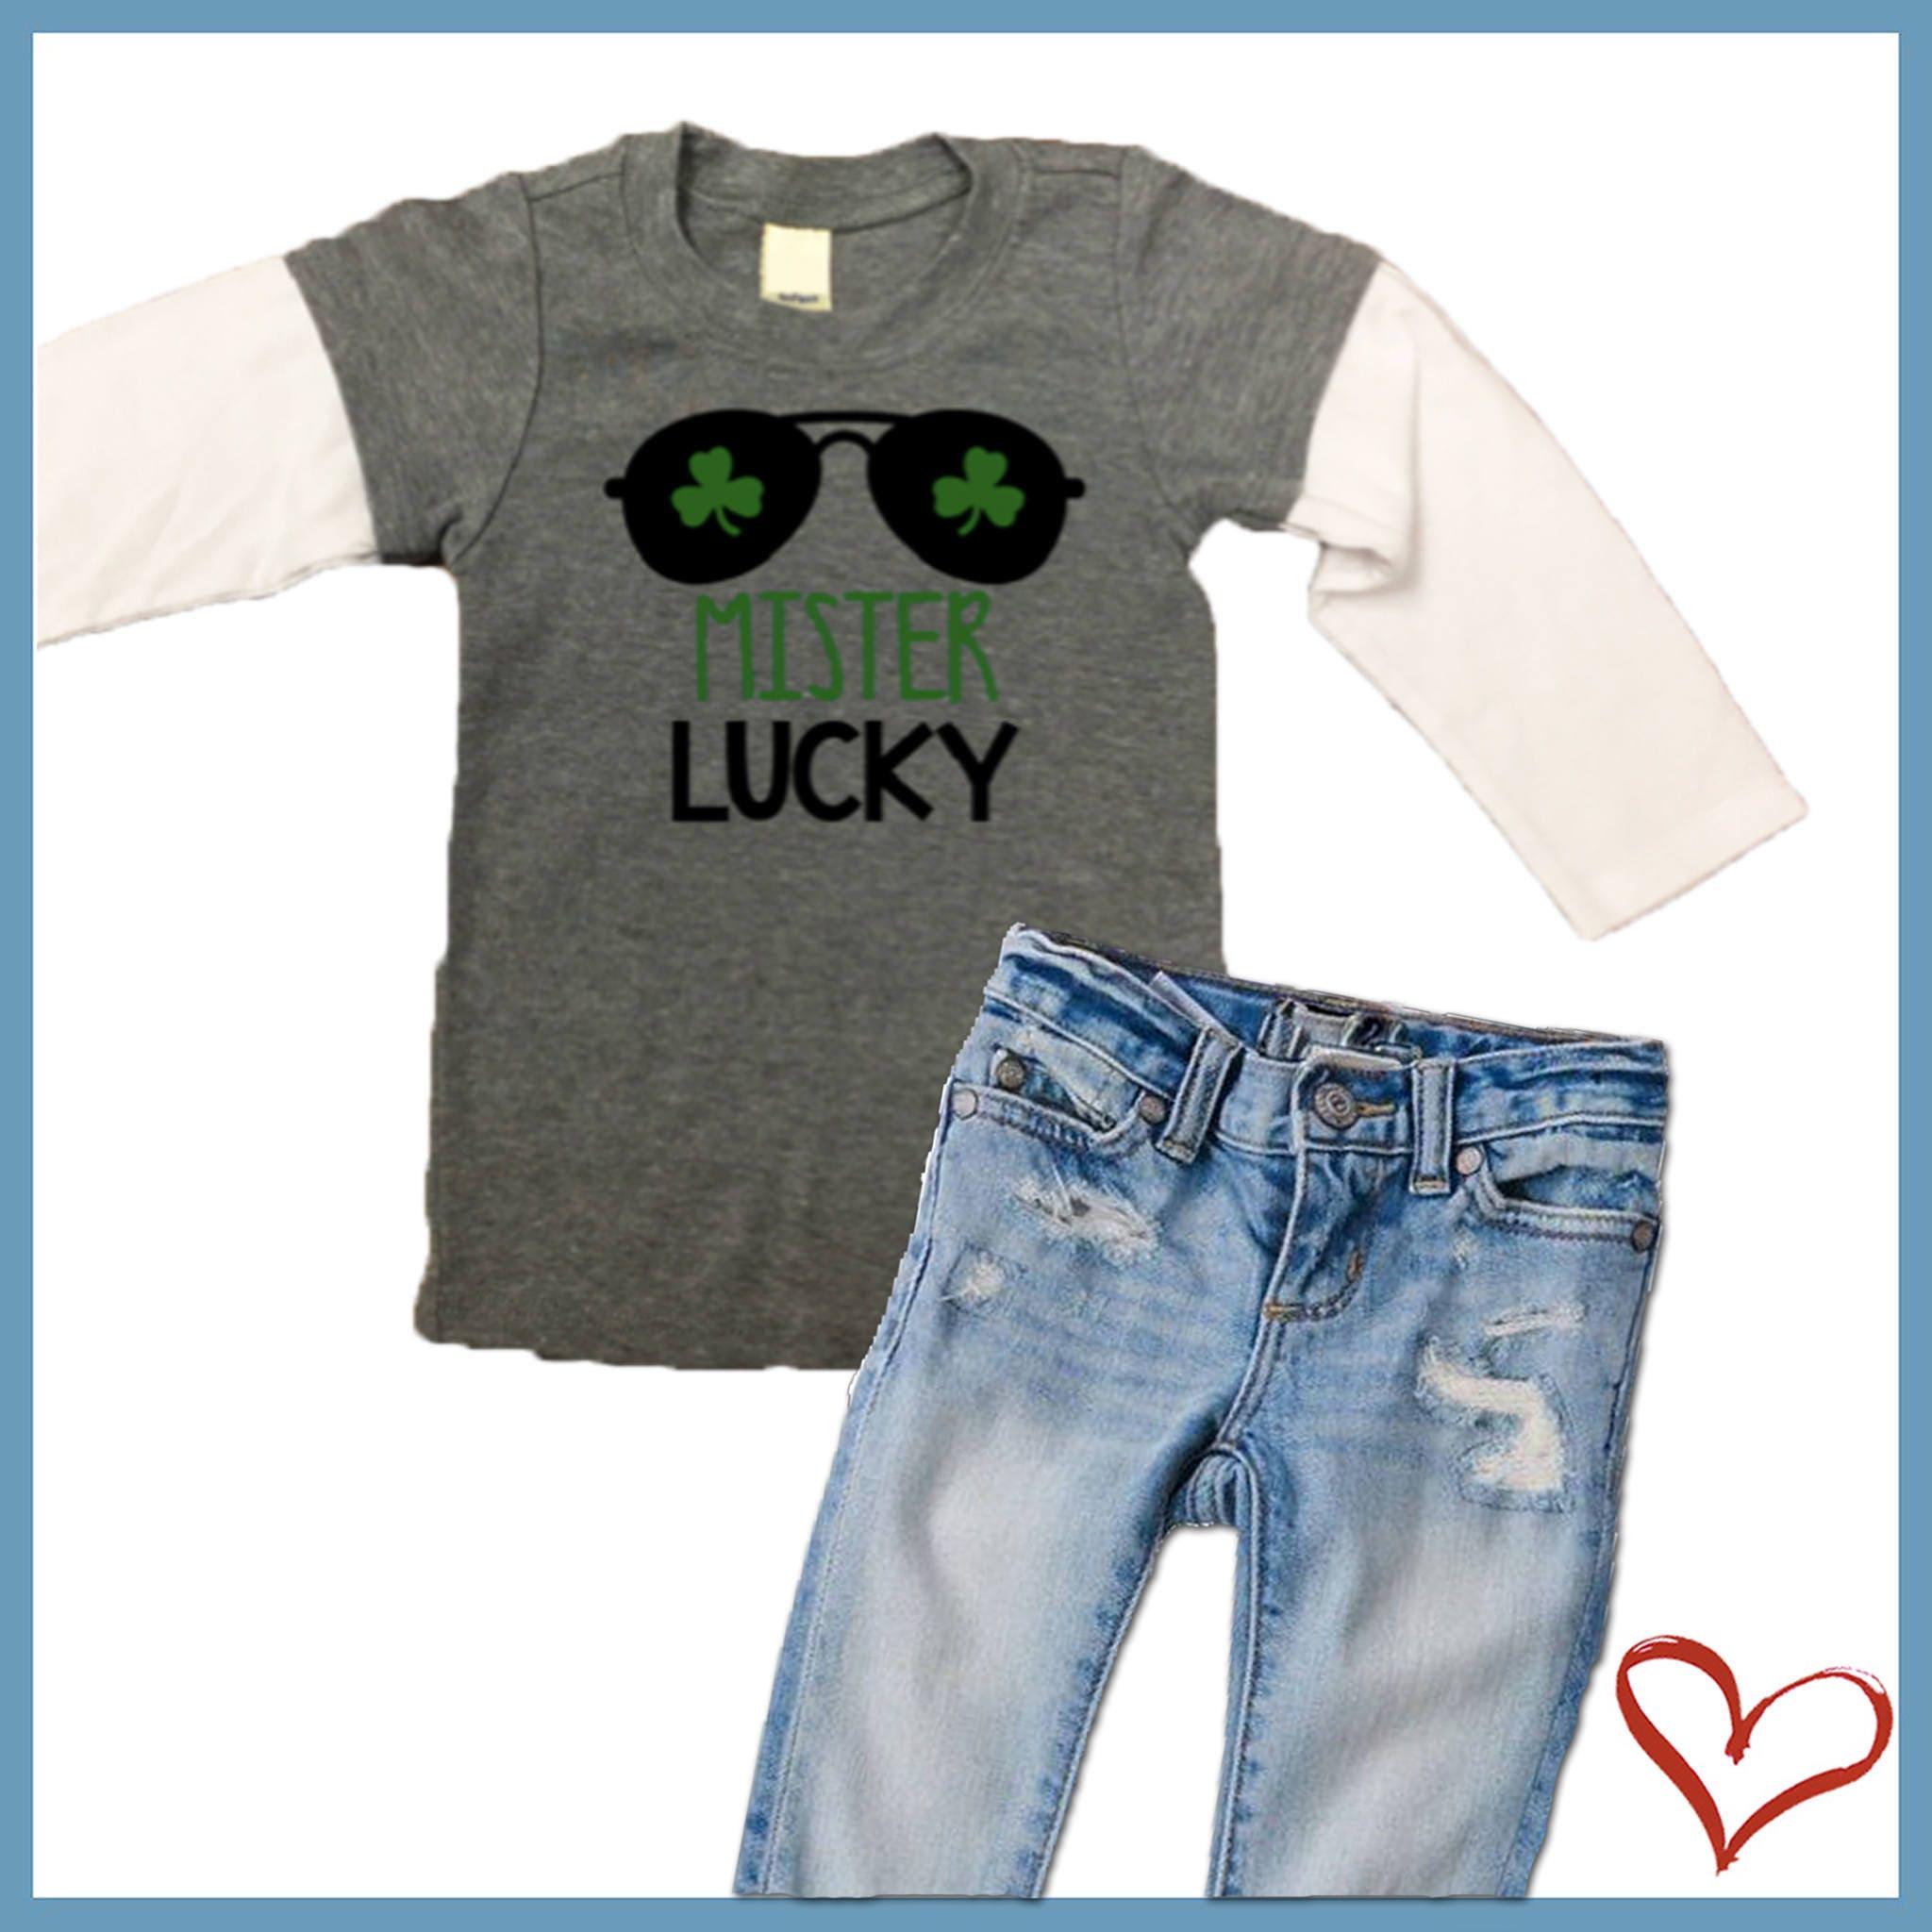 St Patricks Day Shirt Mister Lucky Saint Patricks Baby